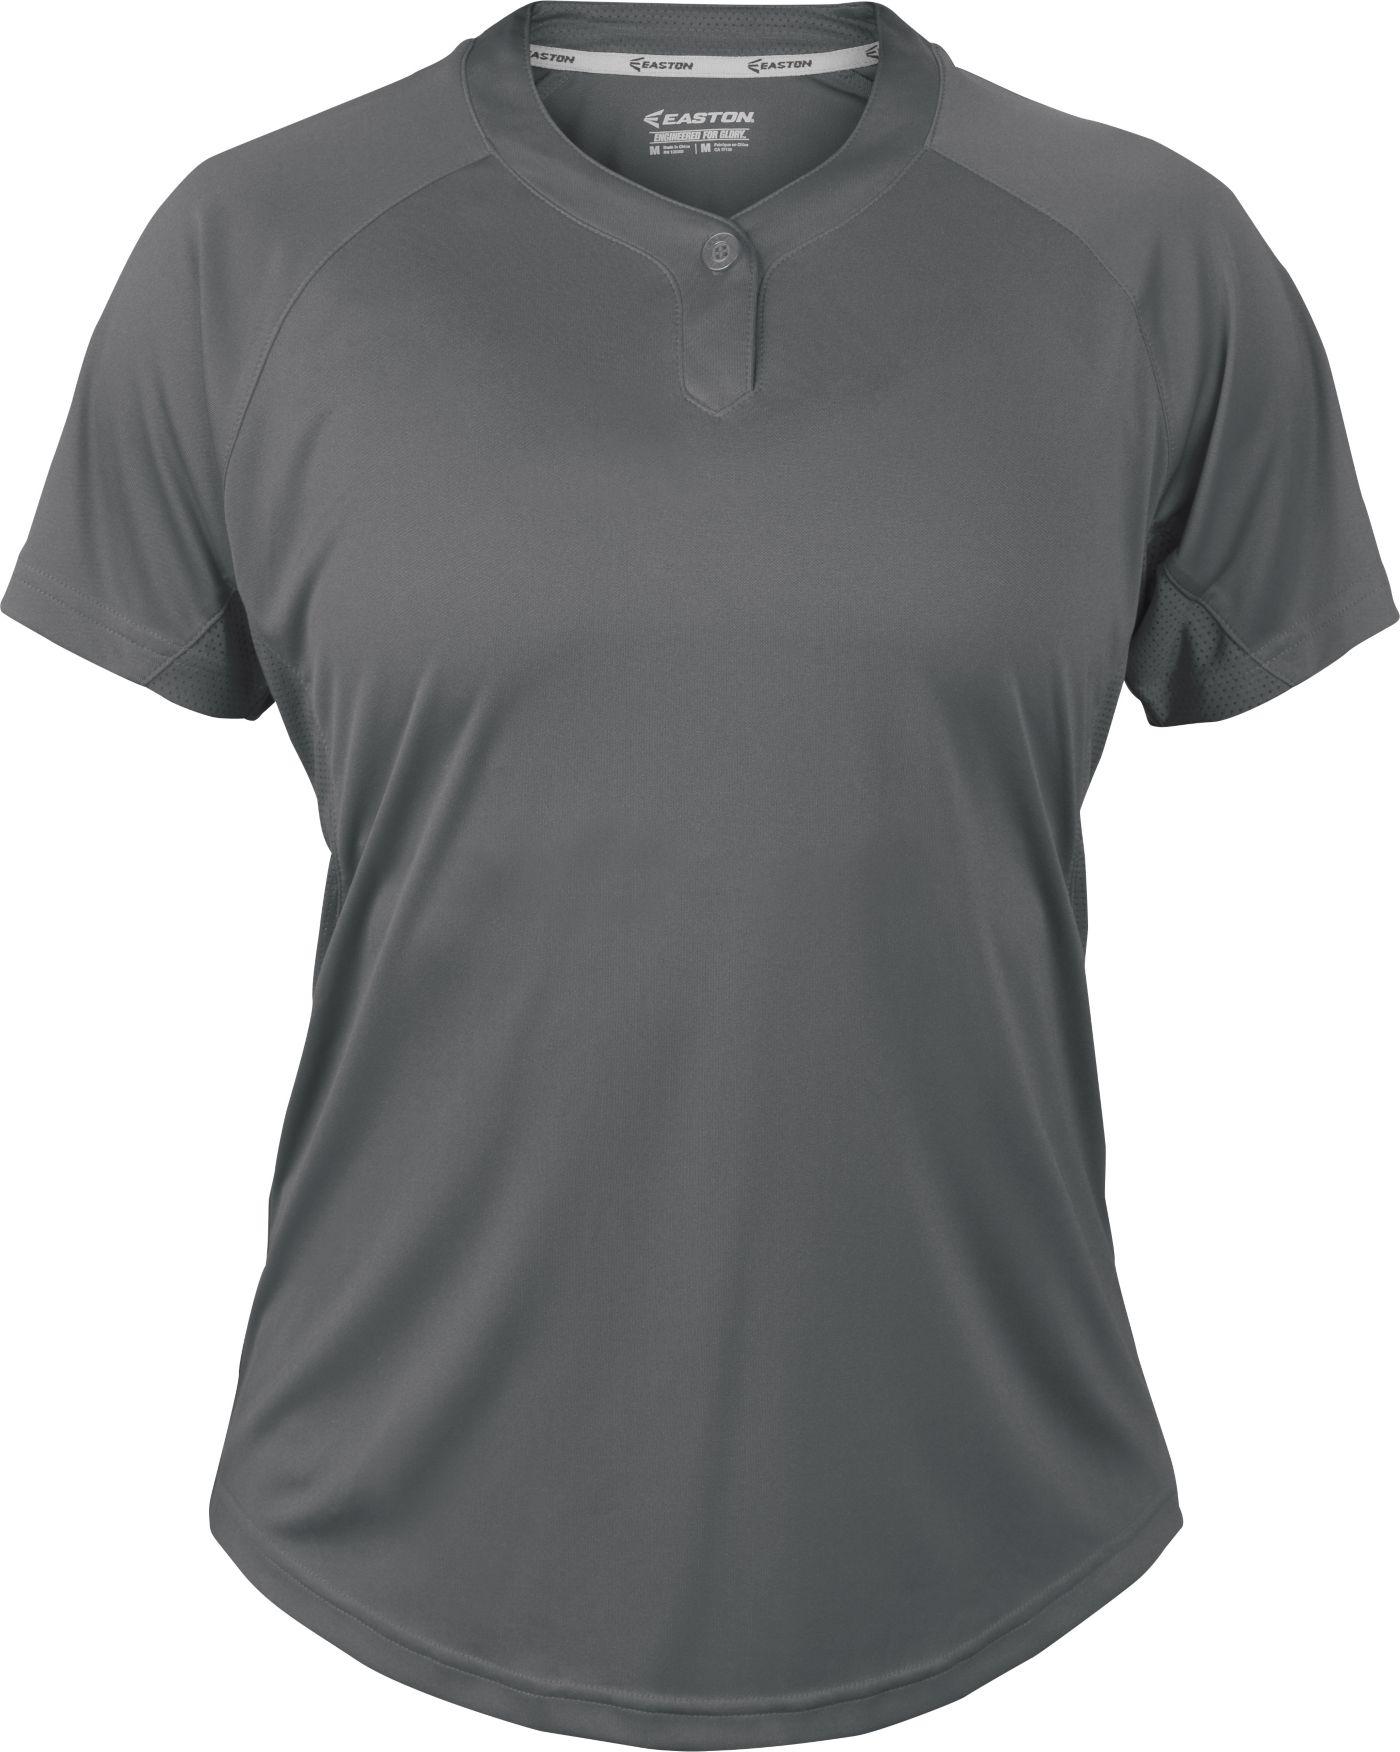 Easton Women's M7 Button Homeplate Jersey